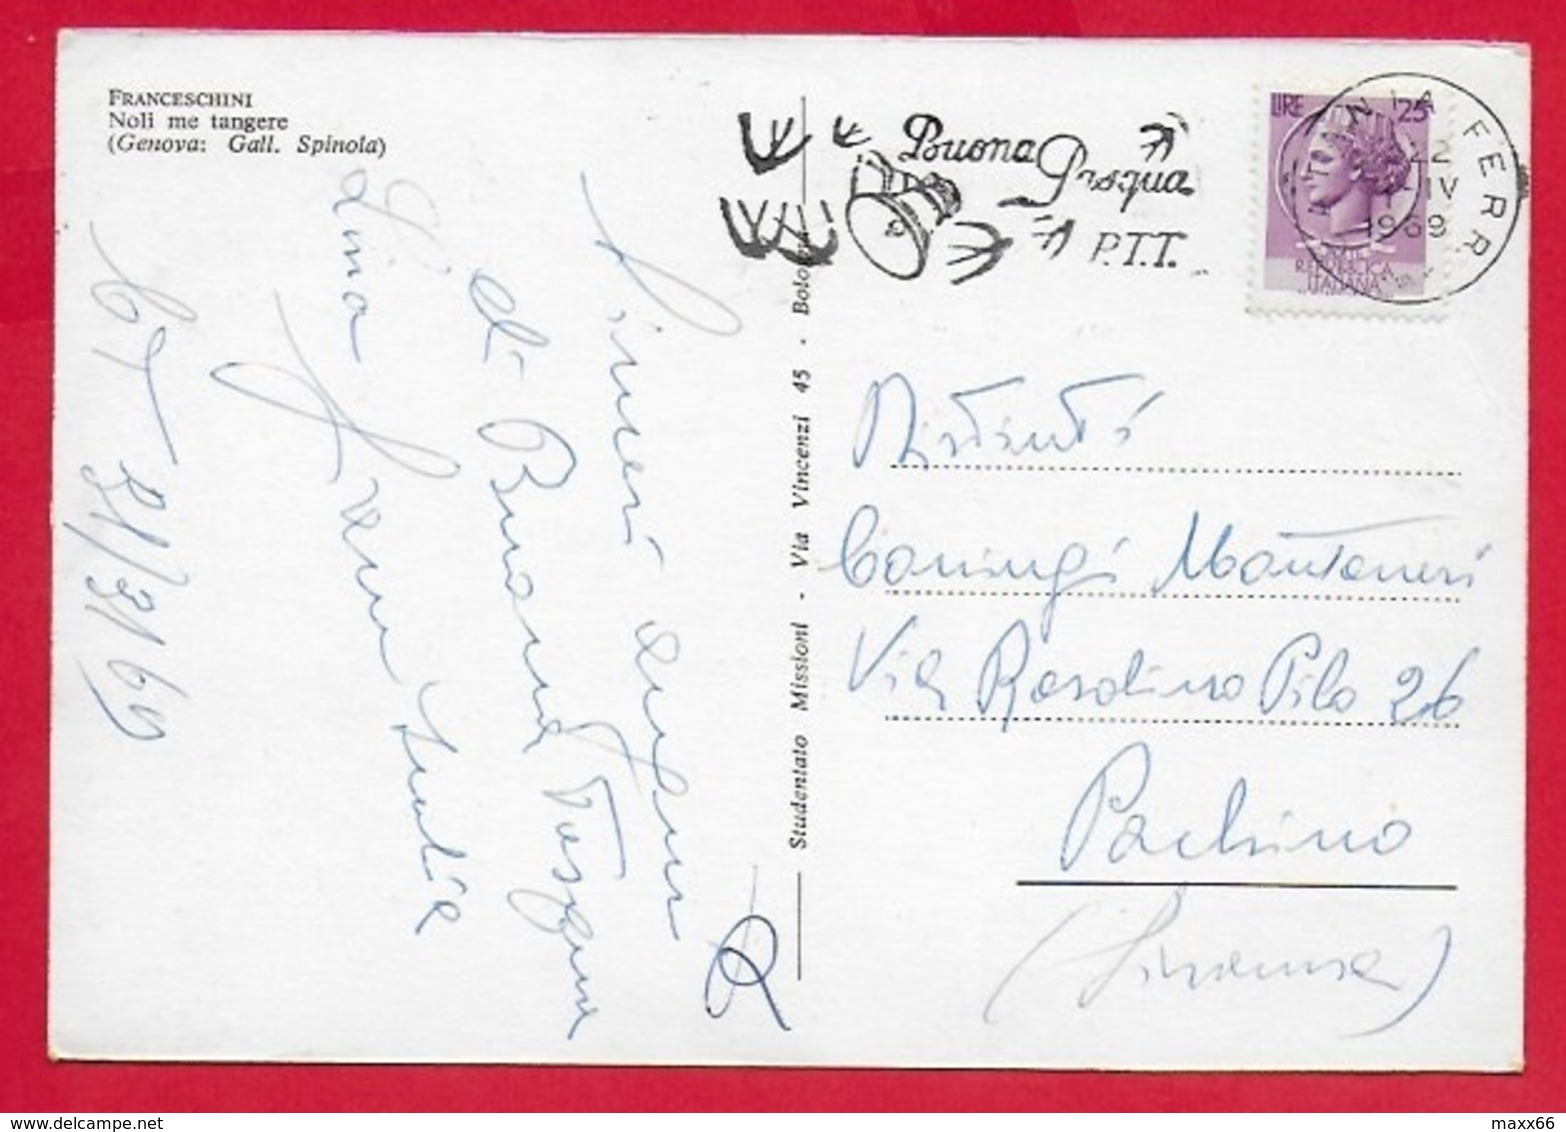 CARTOLINA VG ITALIA - Noli Me Tangere - FRANCESCHINI - Galleria Spinola GENOVA - 10 X 15 - 1969 - Pittura & Quadri